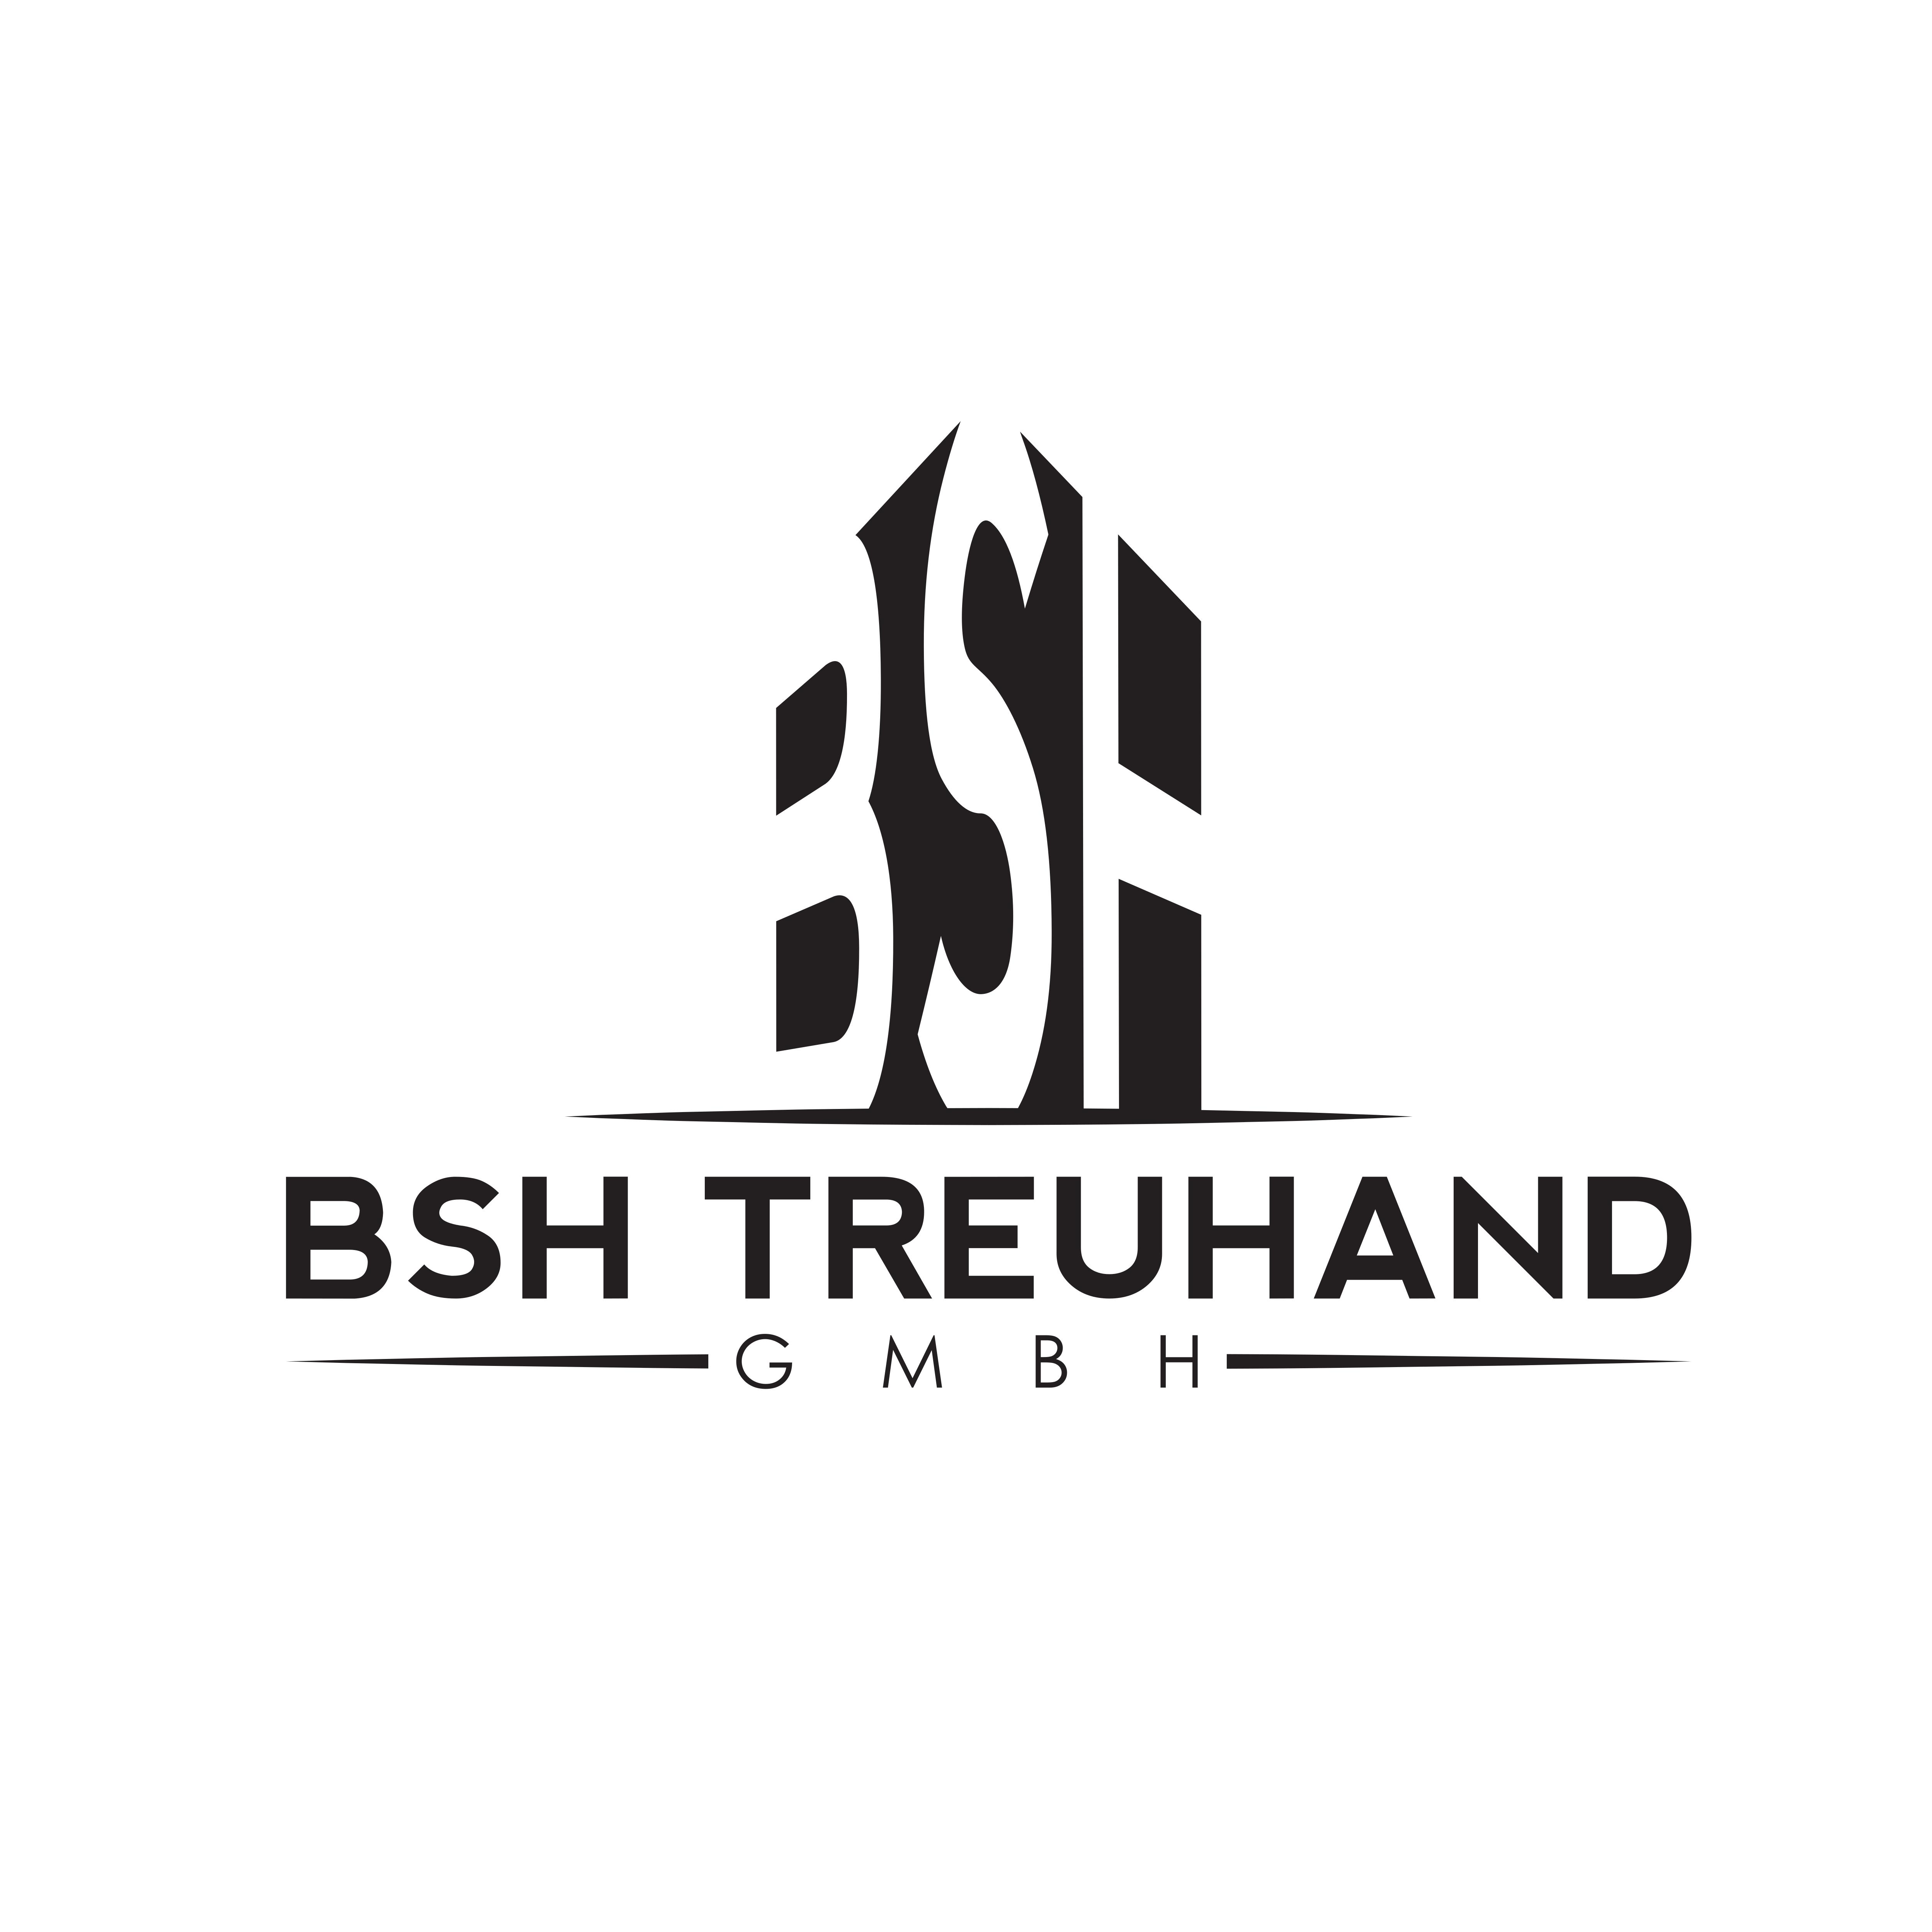 Bild BSH Treuhand GmbH